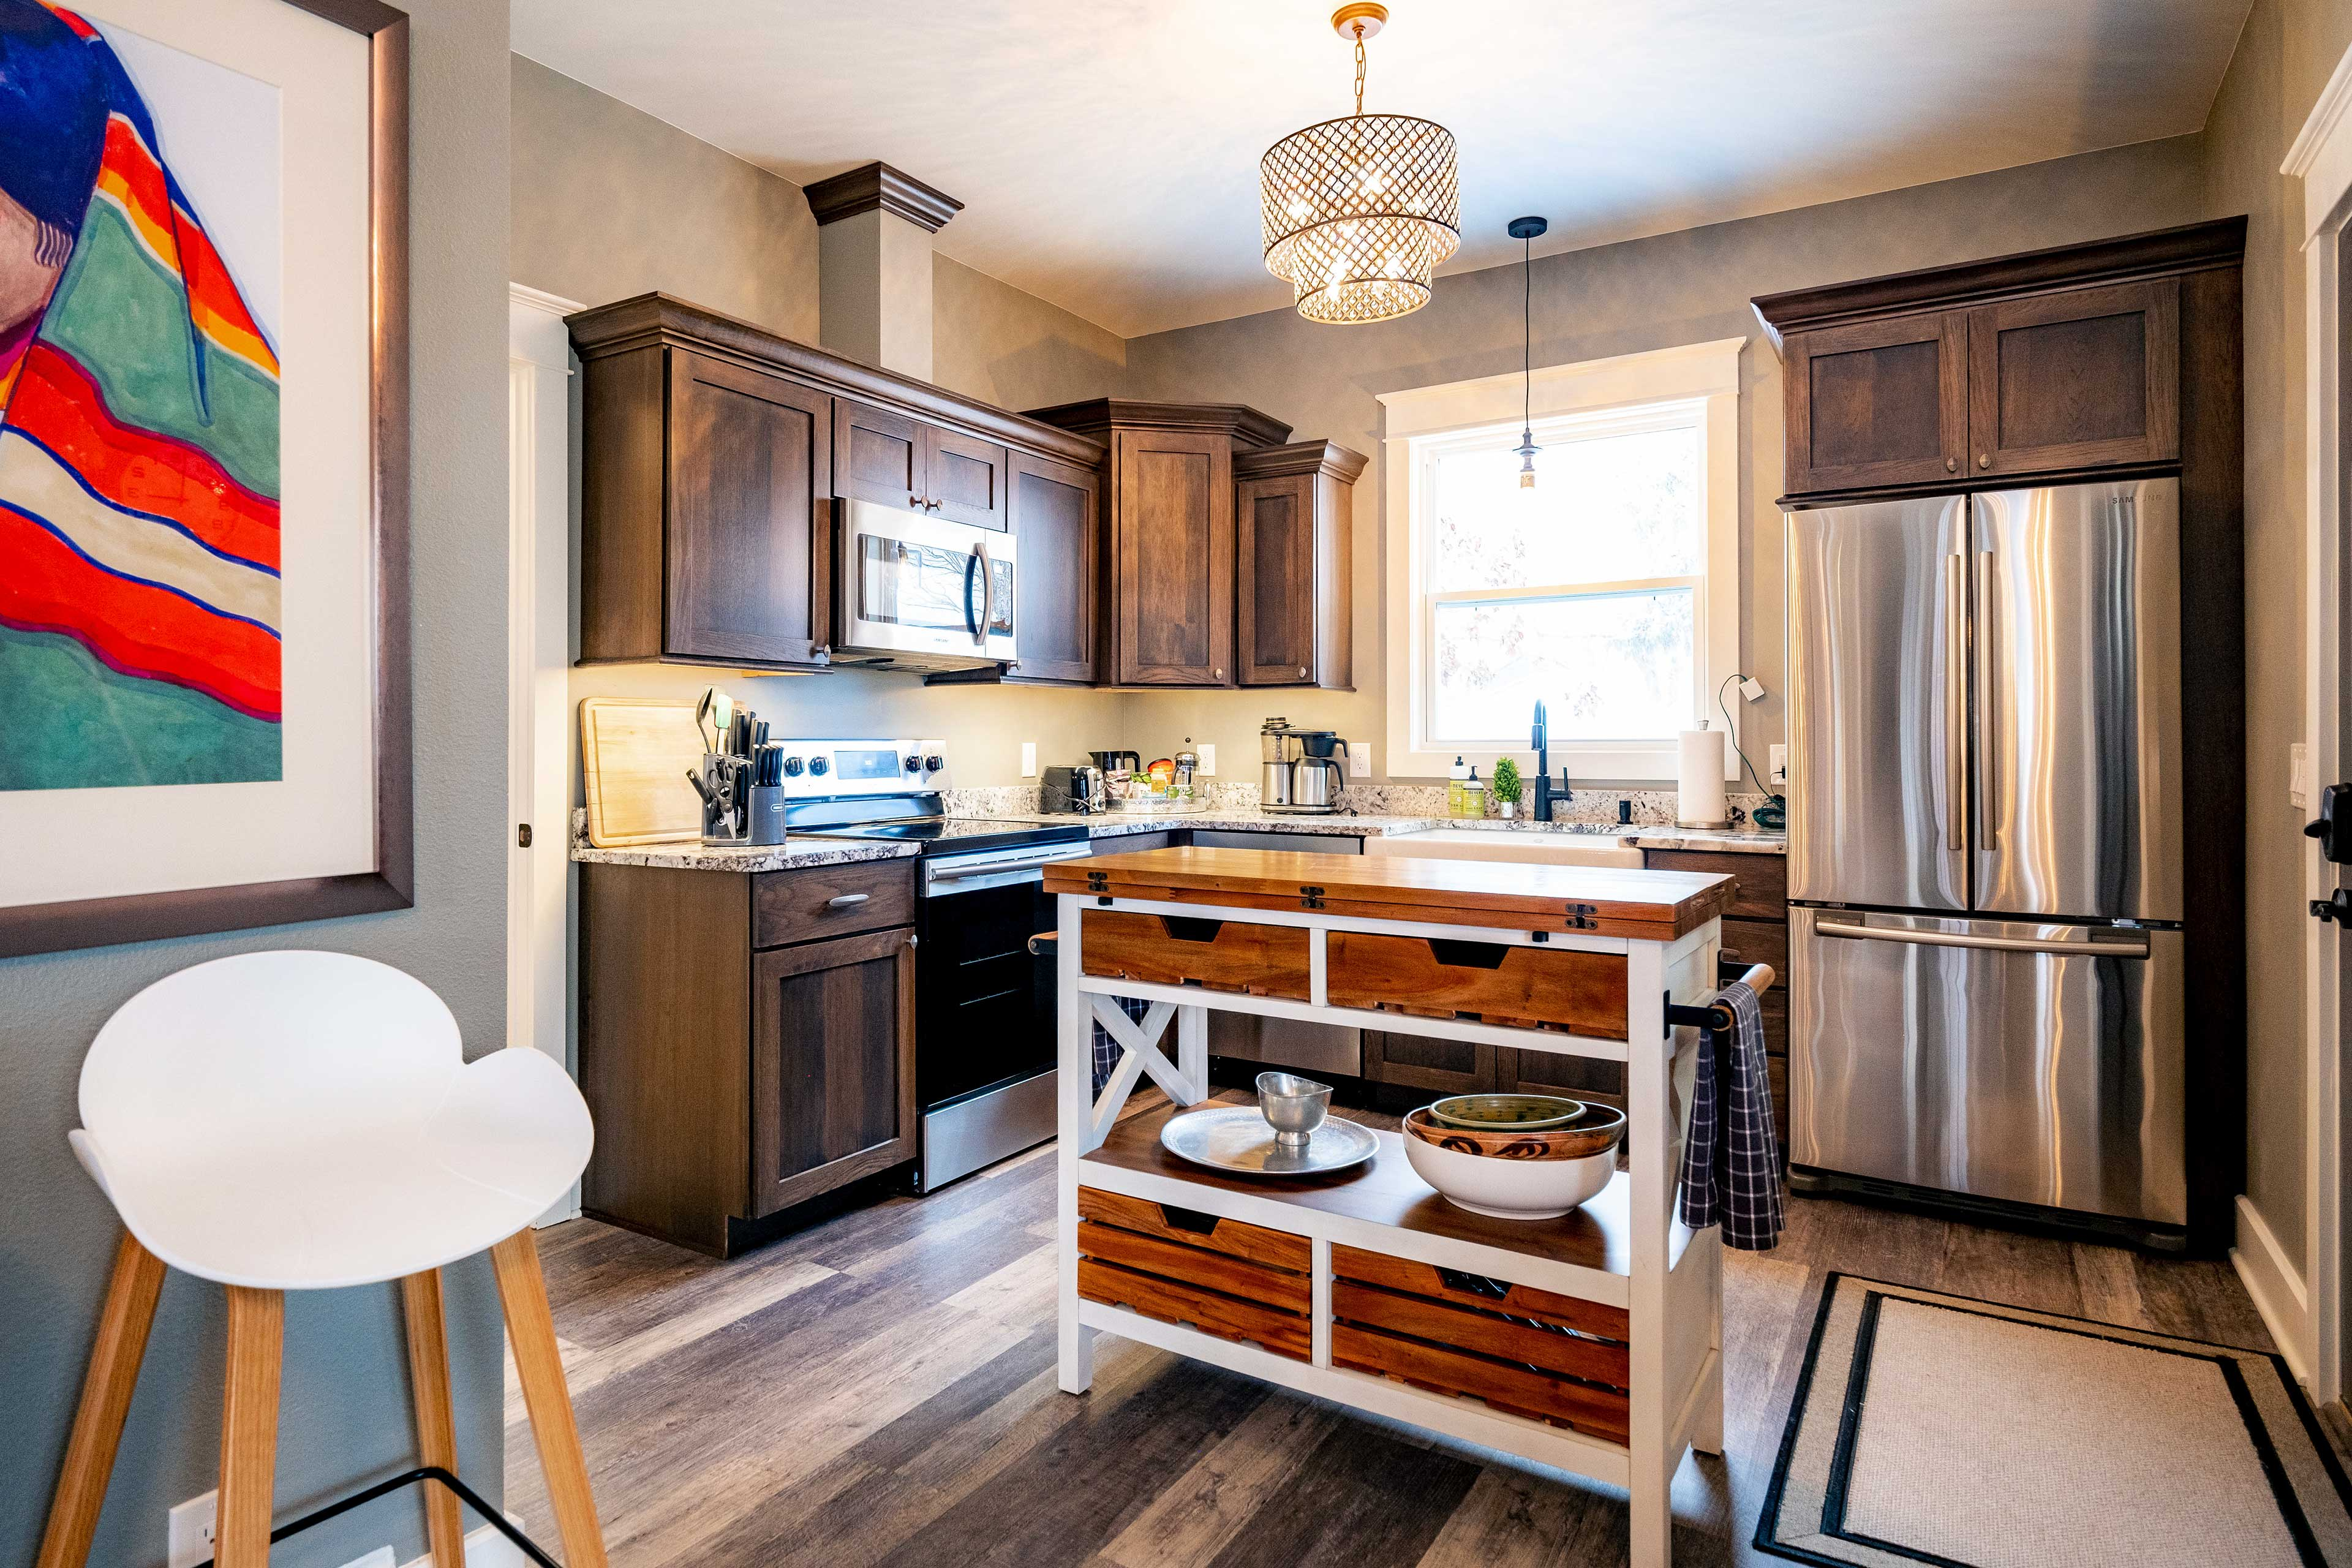 Kitchen | Stainless Steel Appliances